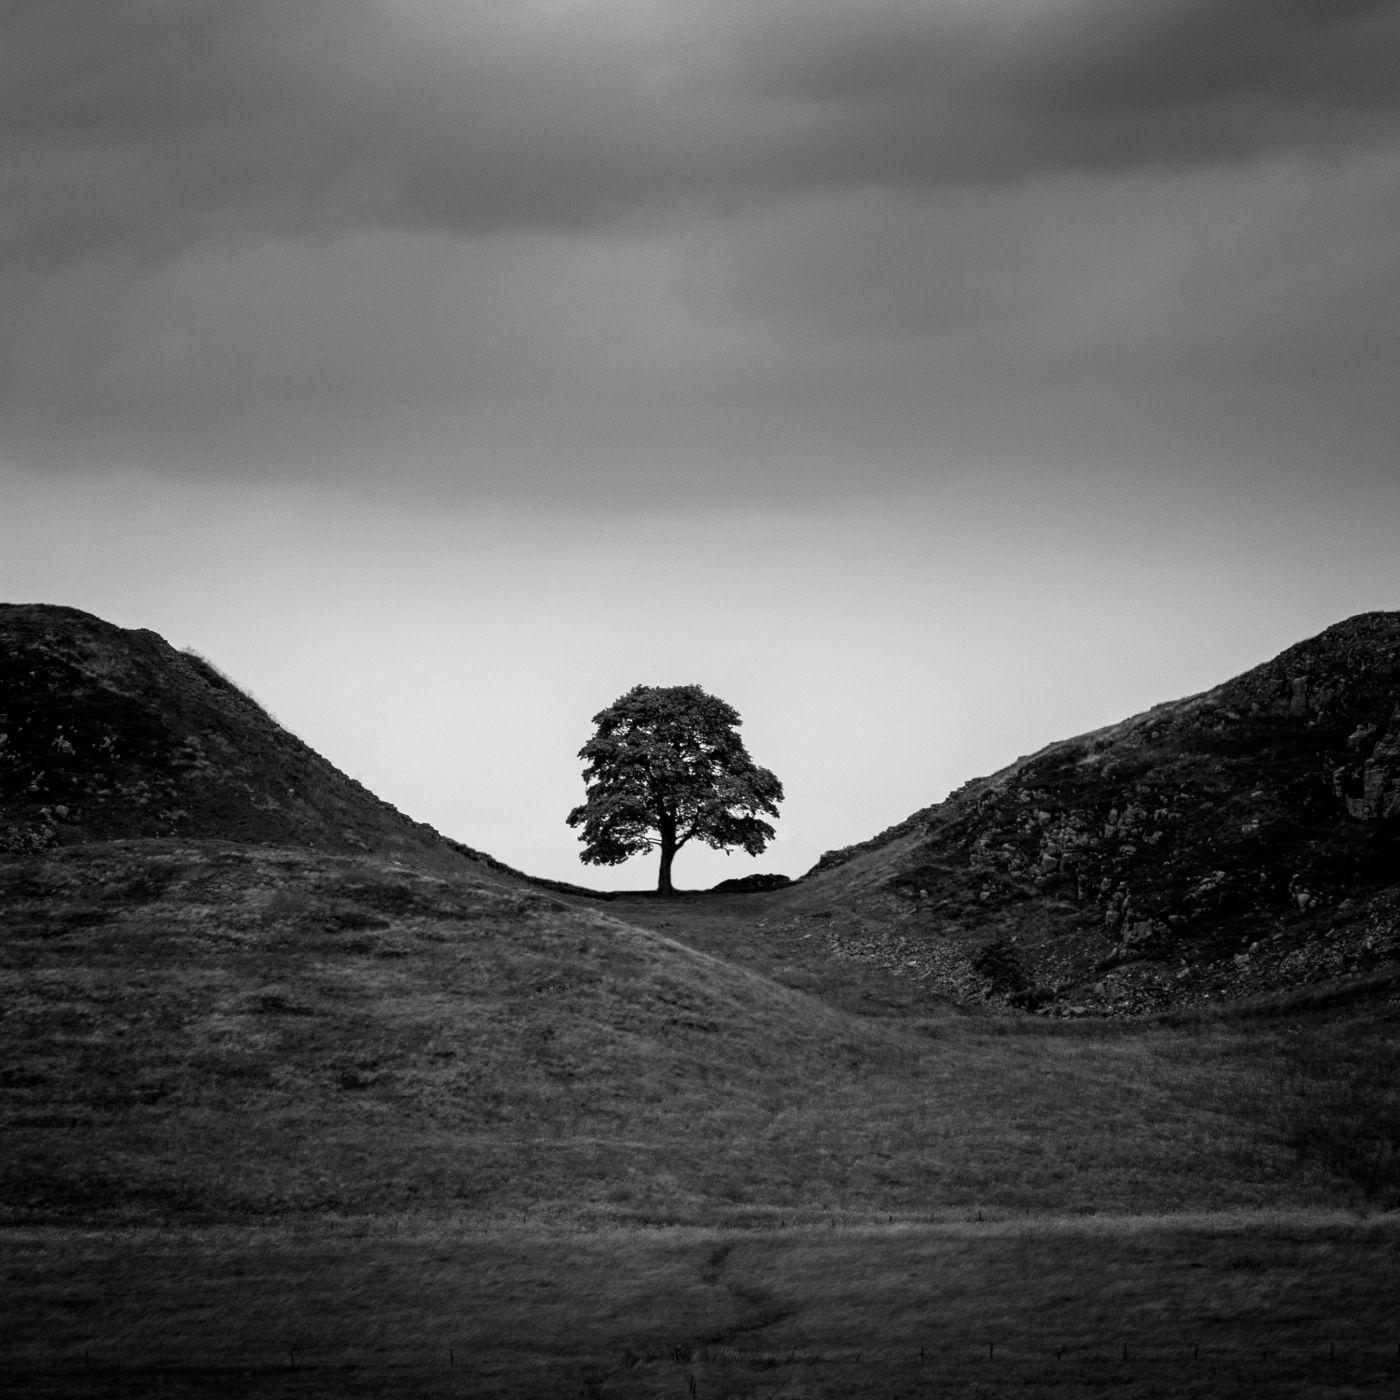 Sycamore gap tree, United Kingdom